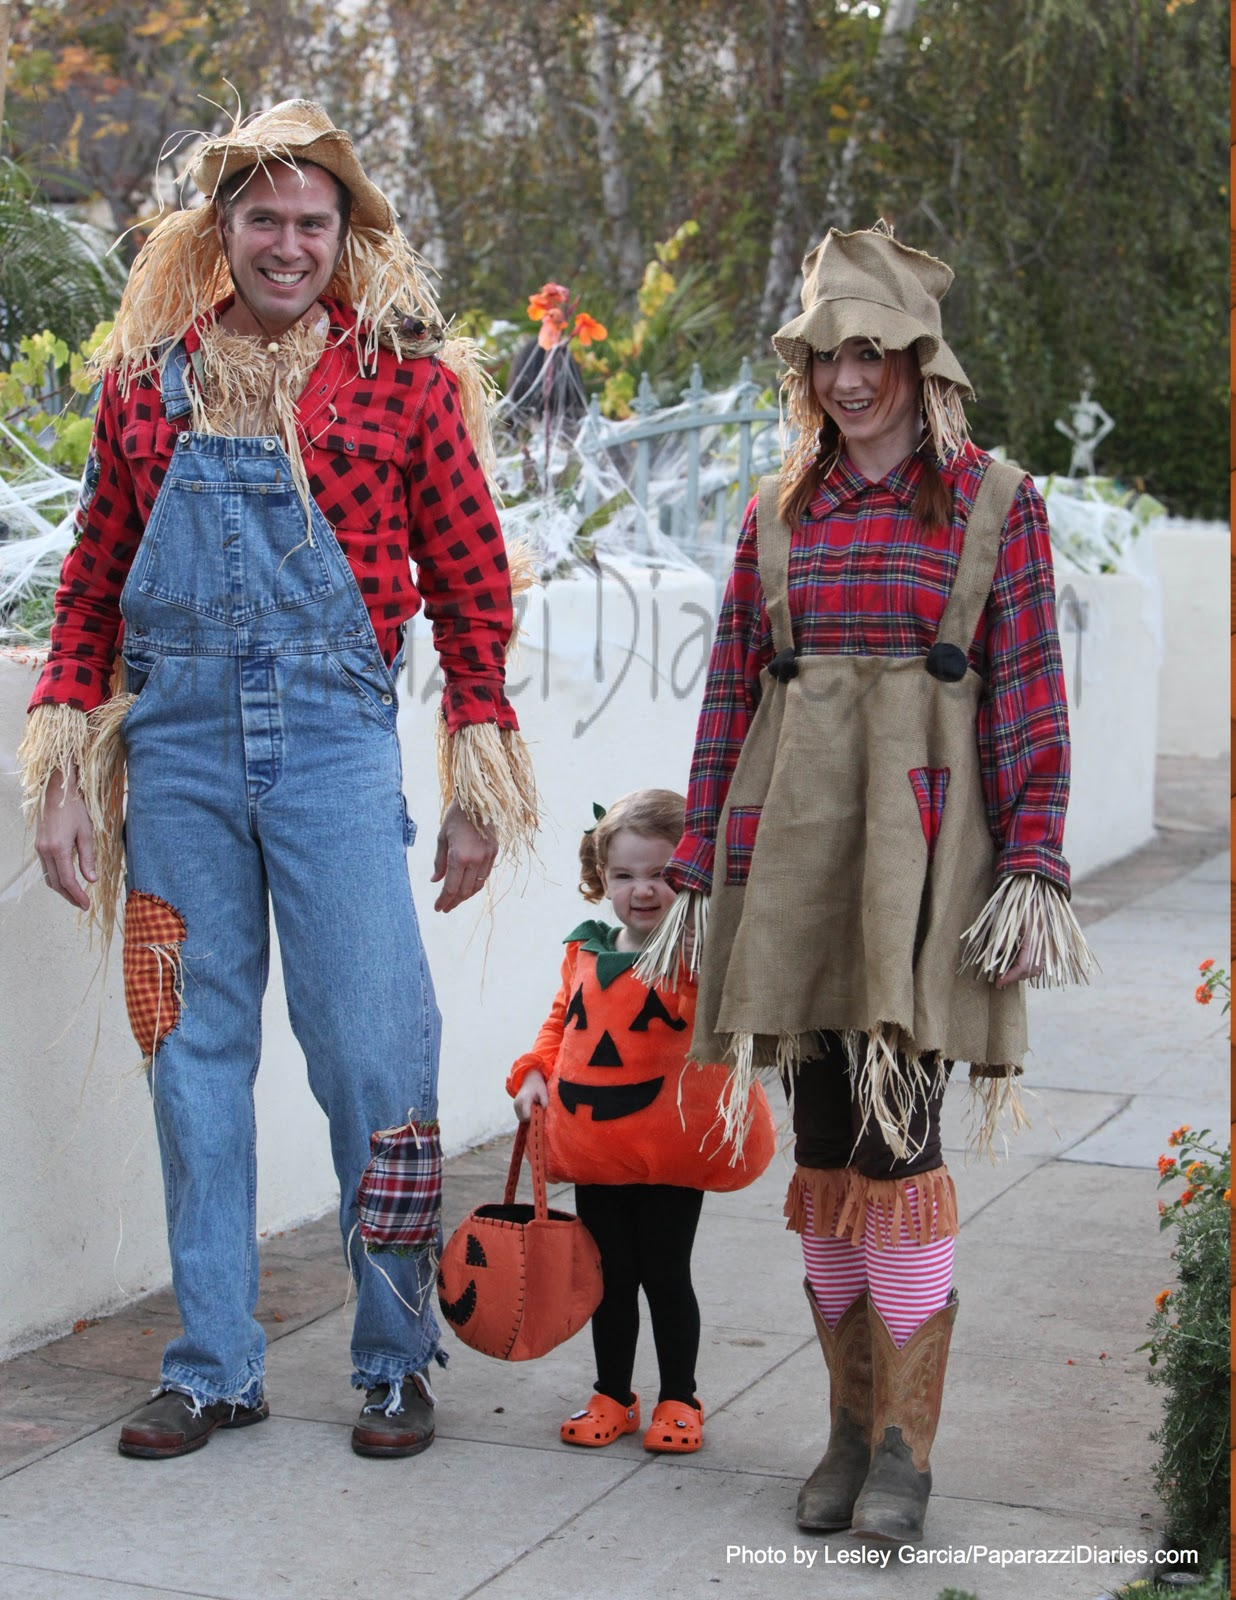 Alyson Hannigan A Candid Family Album 2 Paparazzi Diaries